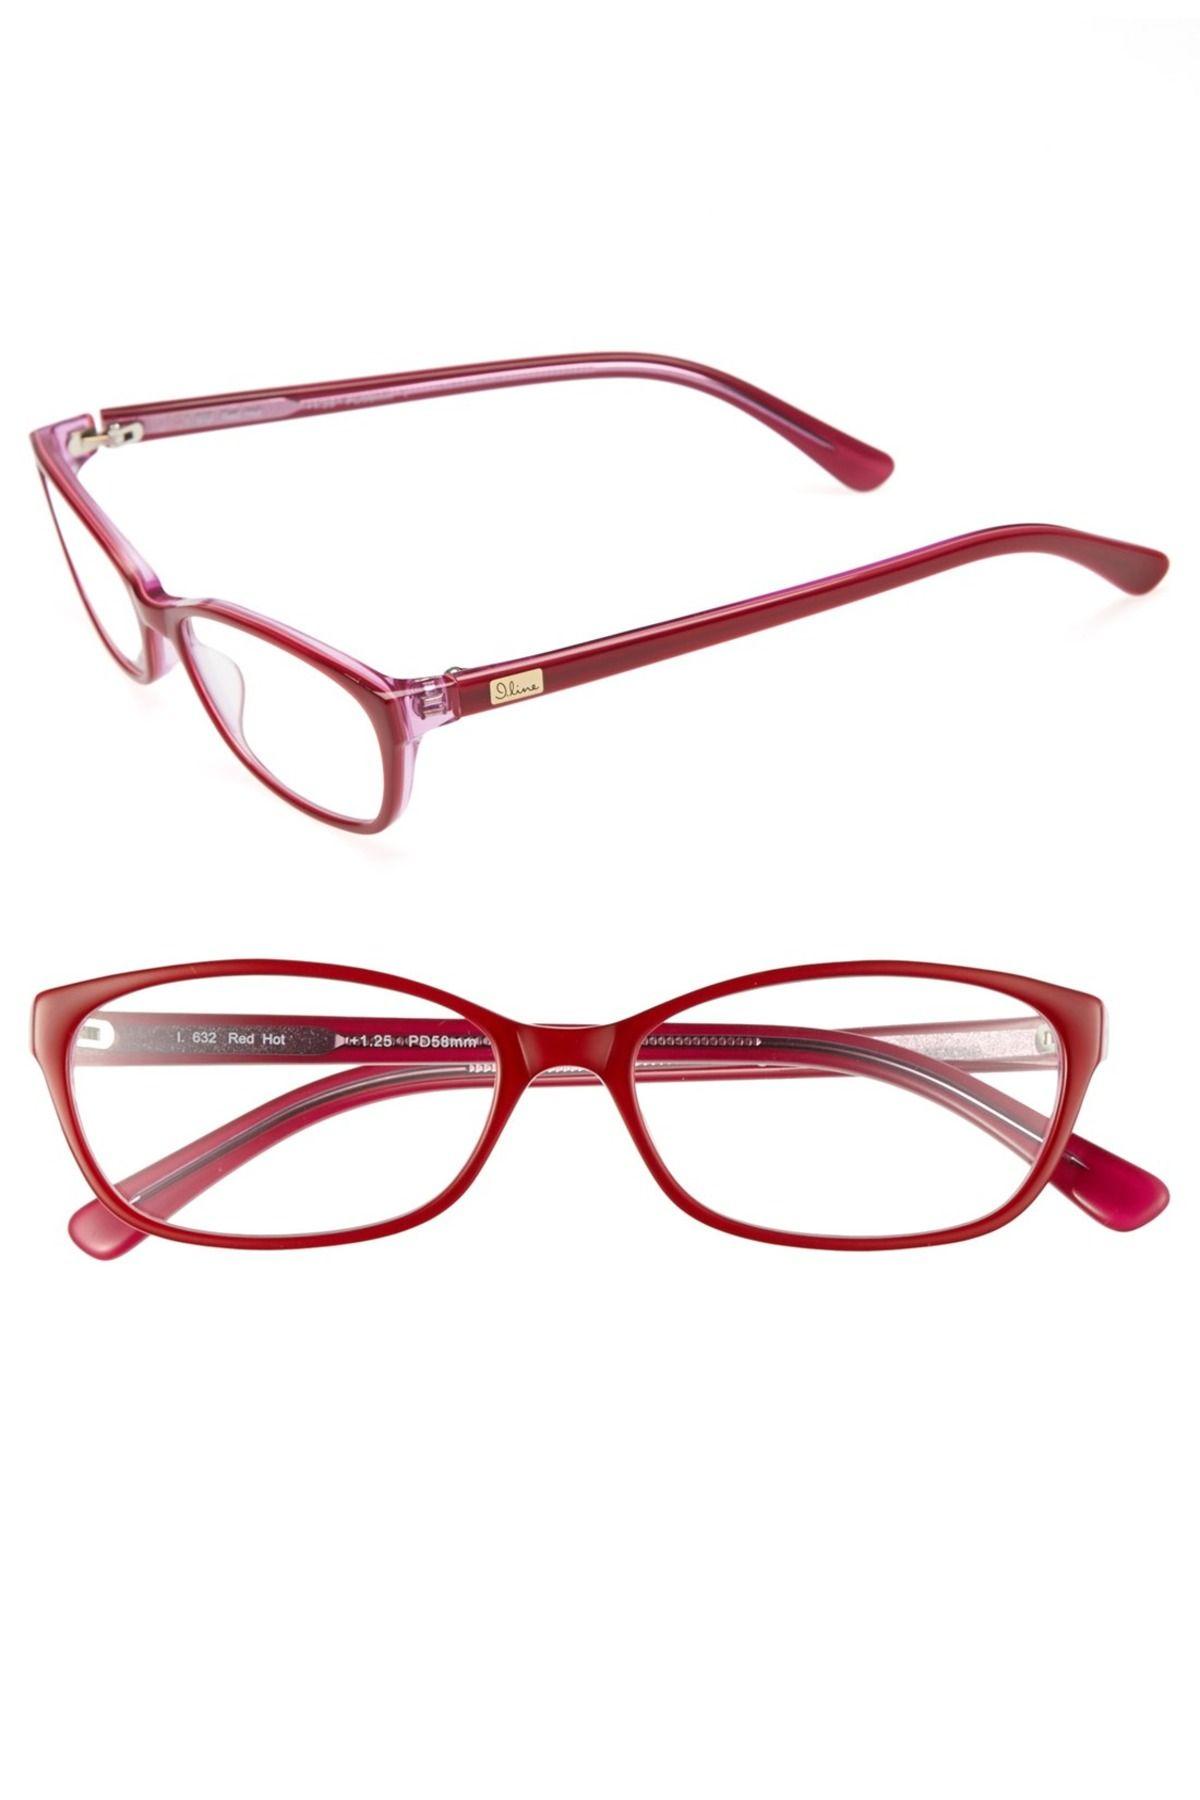 a1bceee4b5e3 I Line Eyewear | I Line Eyewear 'Red Hot' 58mm Reading Glasses ...